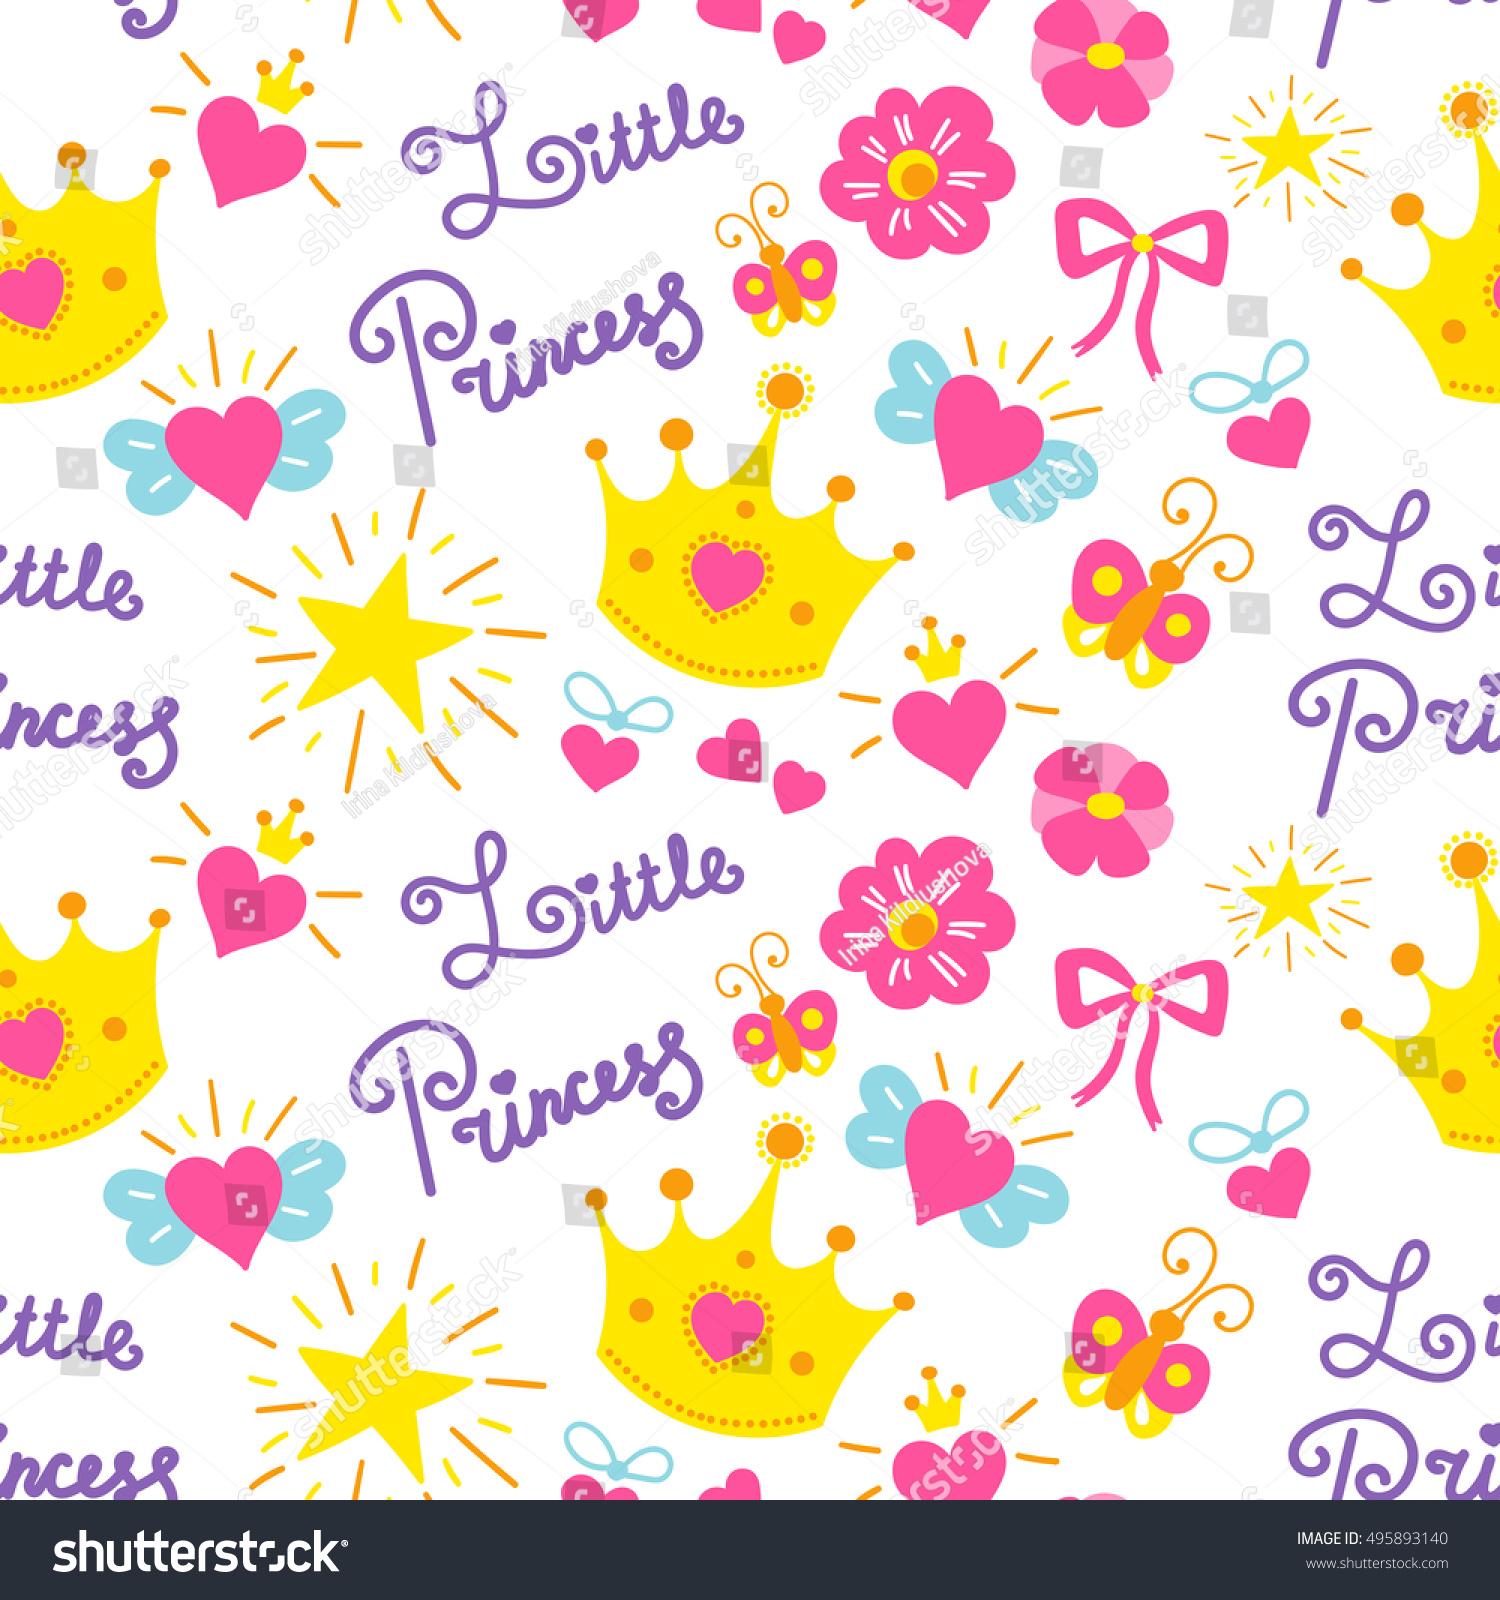 Little Princess Pattern Vector Cute Girl Stock Vector Royalty Free 495893140